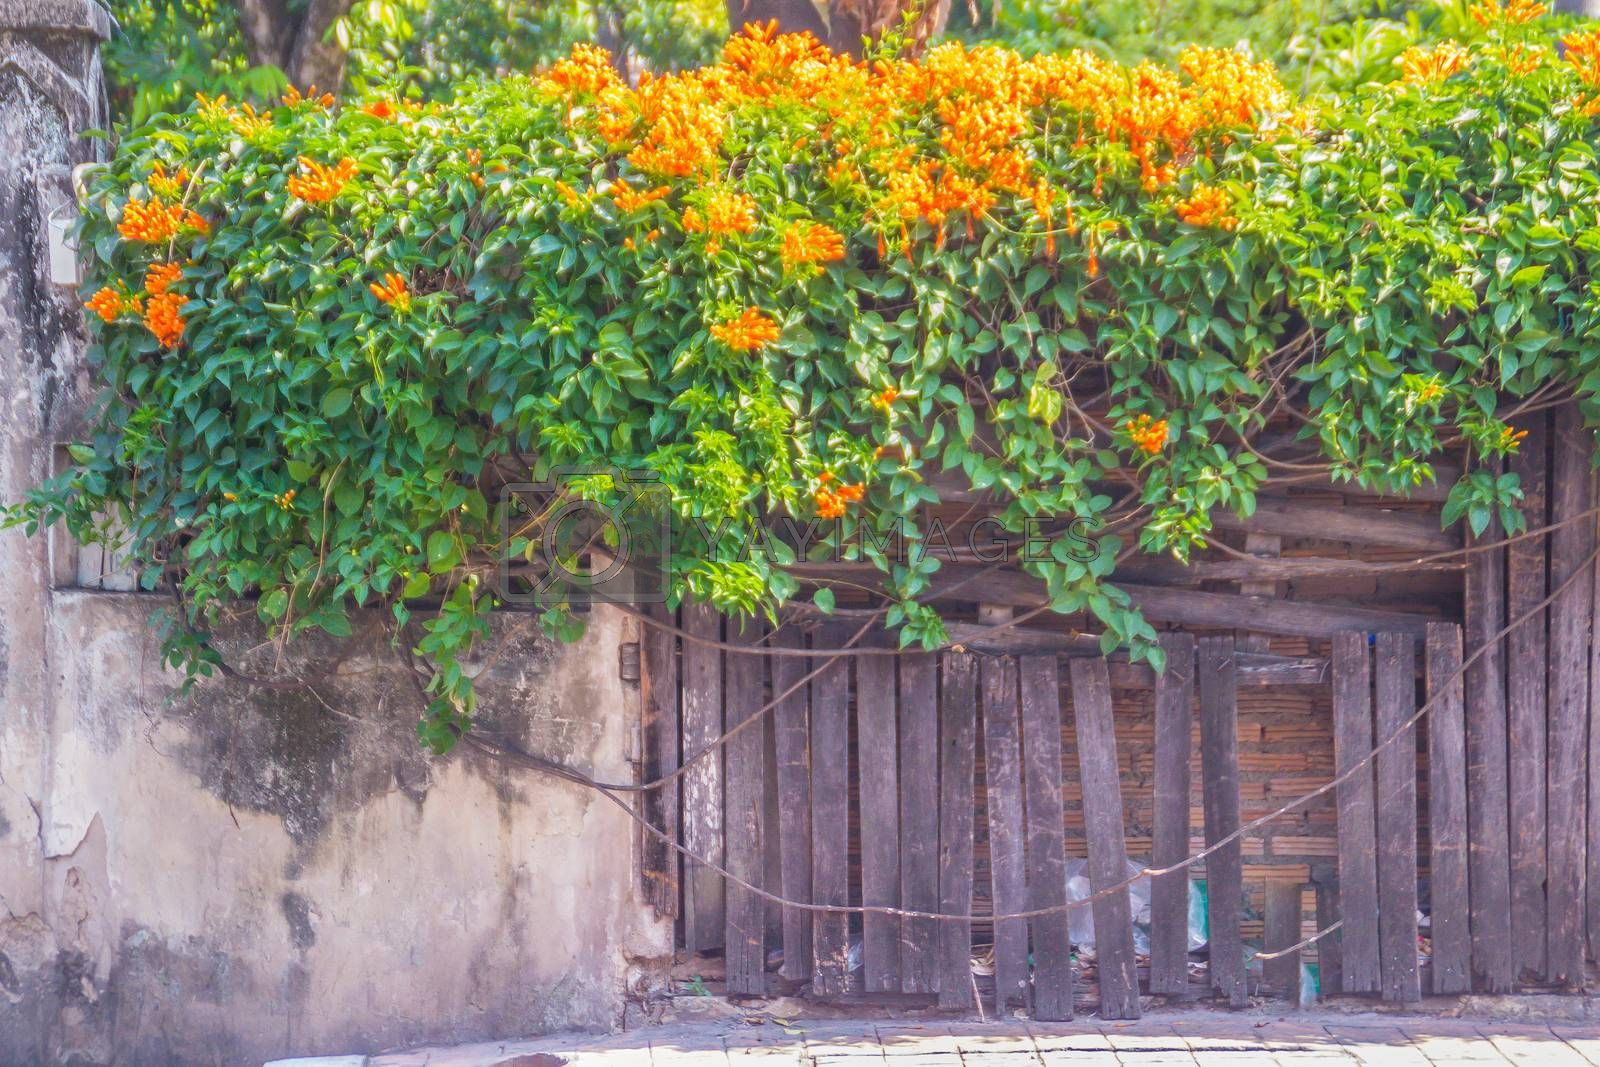 Beautiful orange trumpet flowers (Pyrostegia venusta) blooming on old fence background. Pyrostegia venusta also known as Orange trumpet, Flame flower, Fire-cracker vine, flamevine, orange trumpetvine.